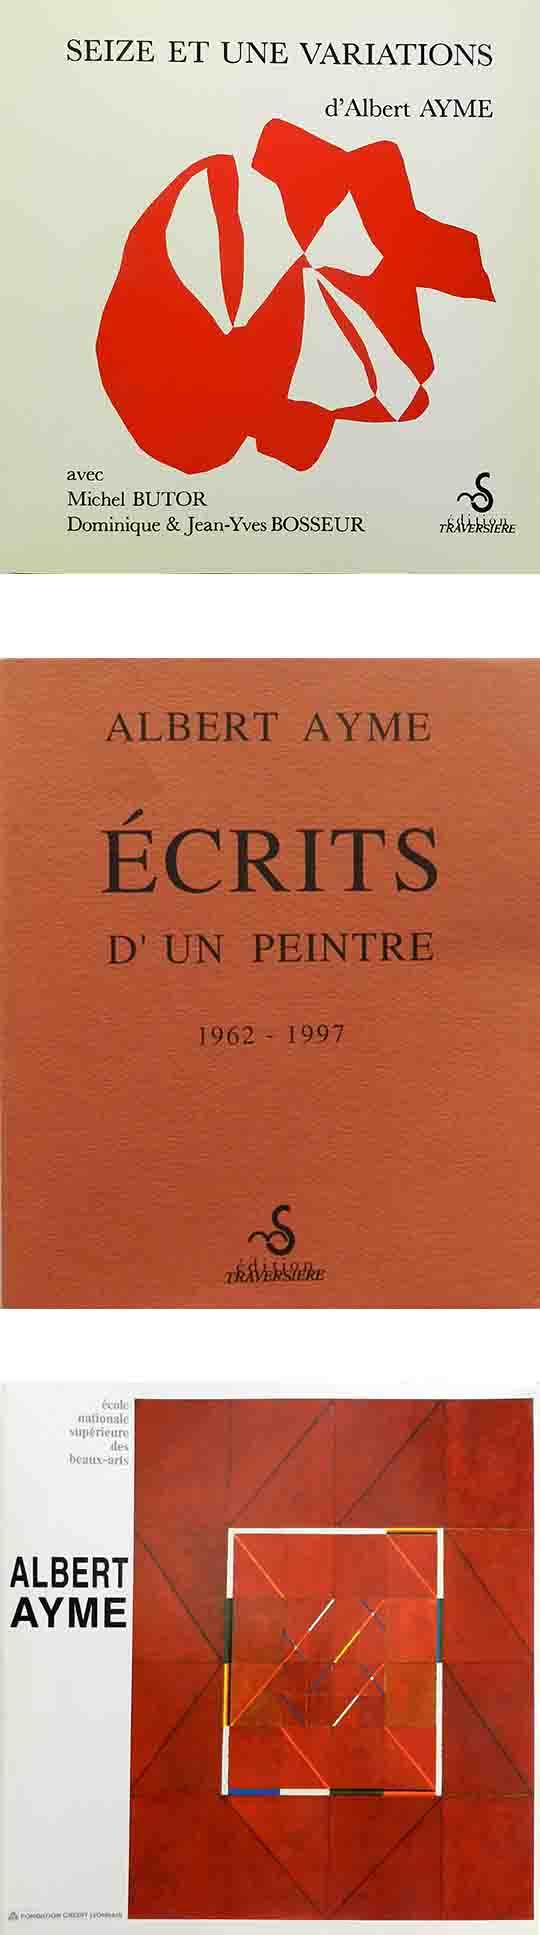 ALBERT AYME - SEIZE ET UNE VARIATIONS